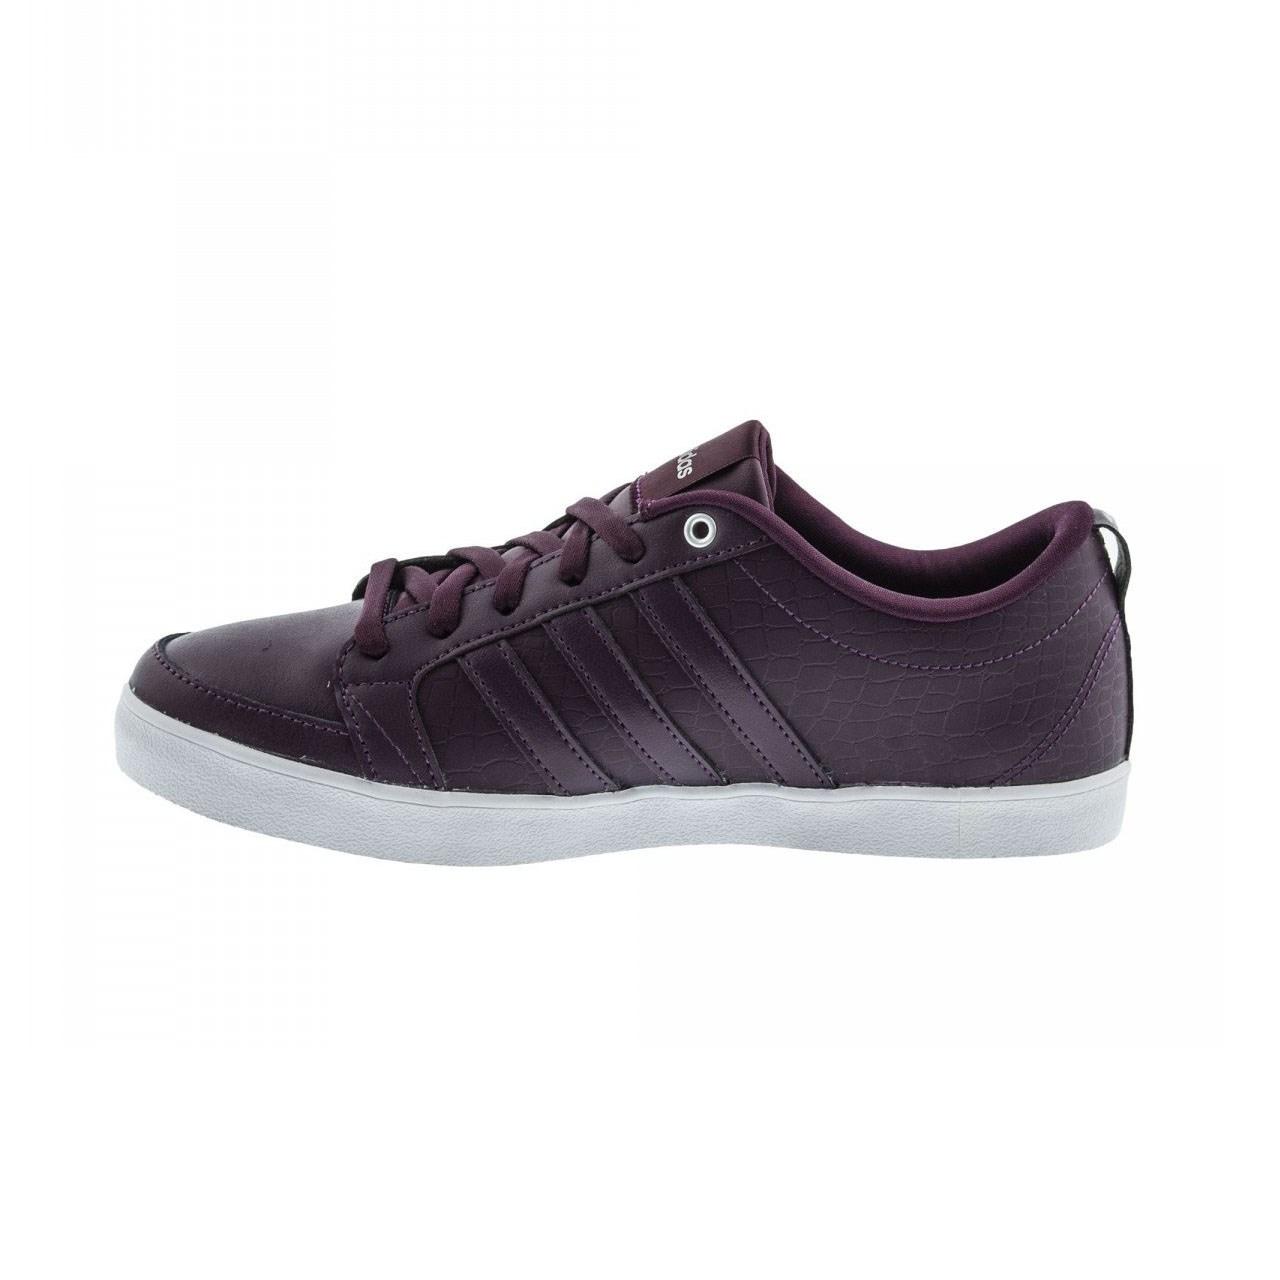 کفش راحتی زنانه آدیداس مدل QT LX